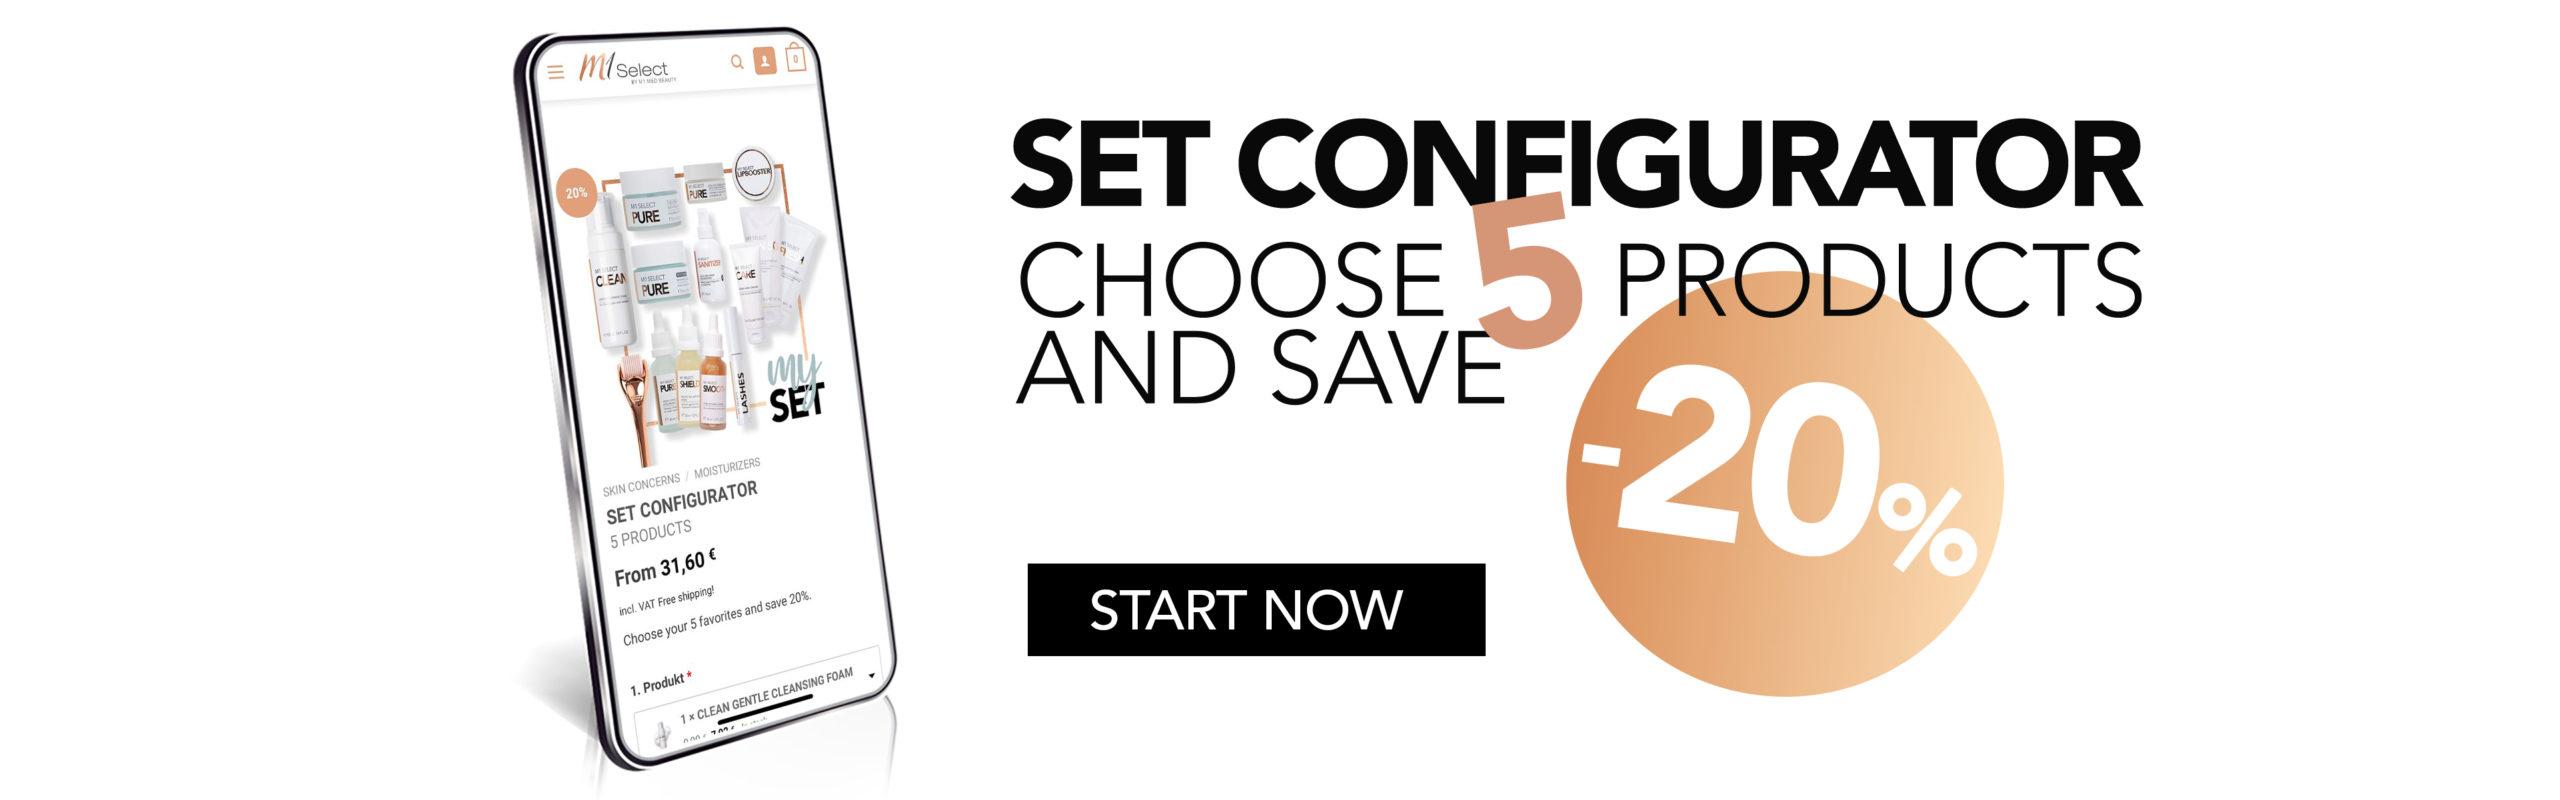 M1 Select Set Configurator